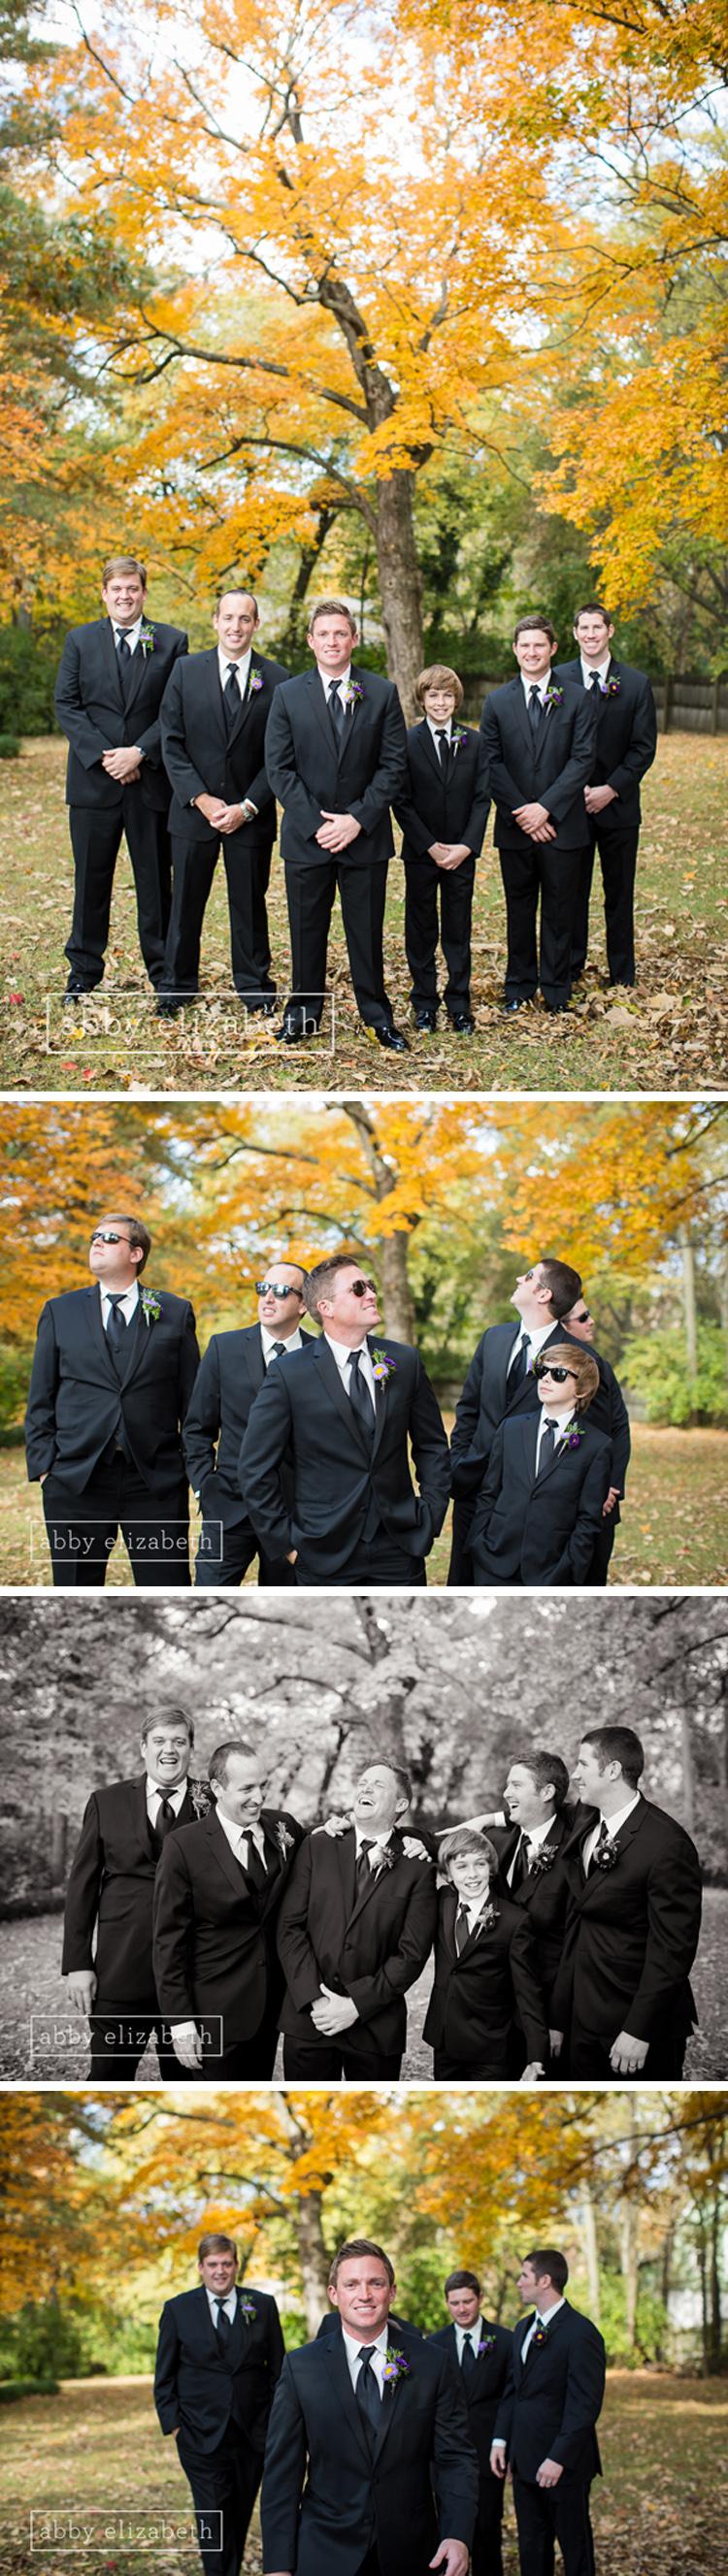 Fall_Wedding_Knoxville_TN_15.jpg